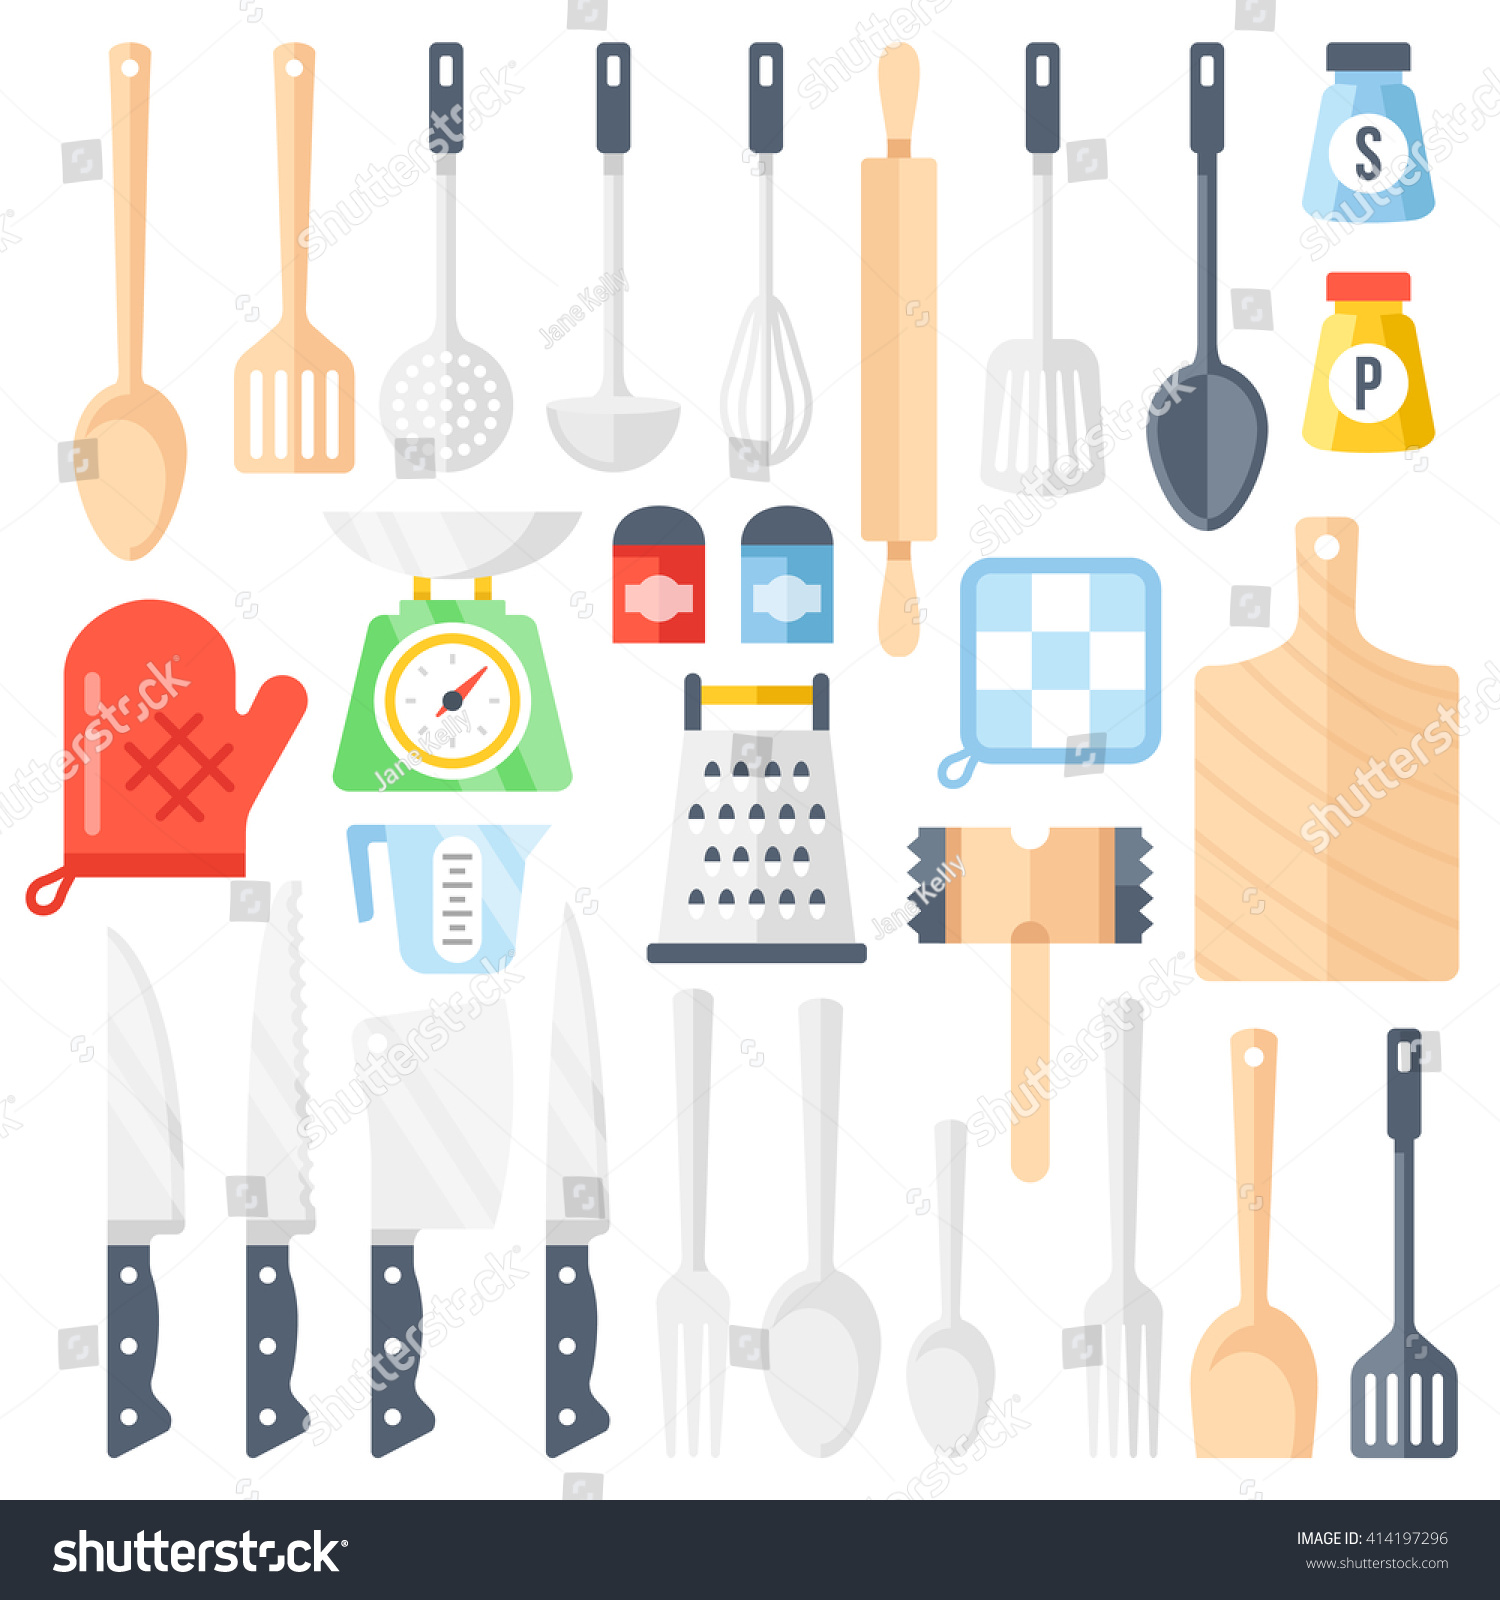 Kitchen Tools Cooking Equipment Kitchen Utensils Set